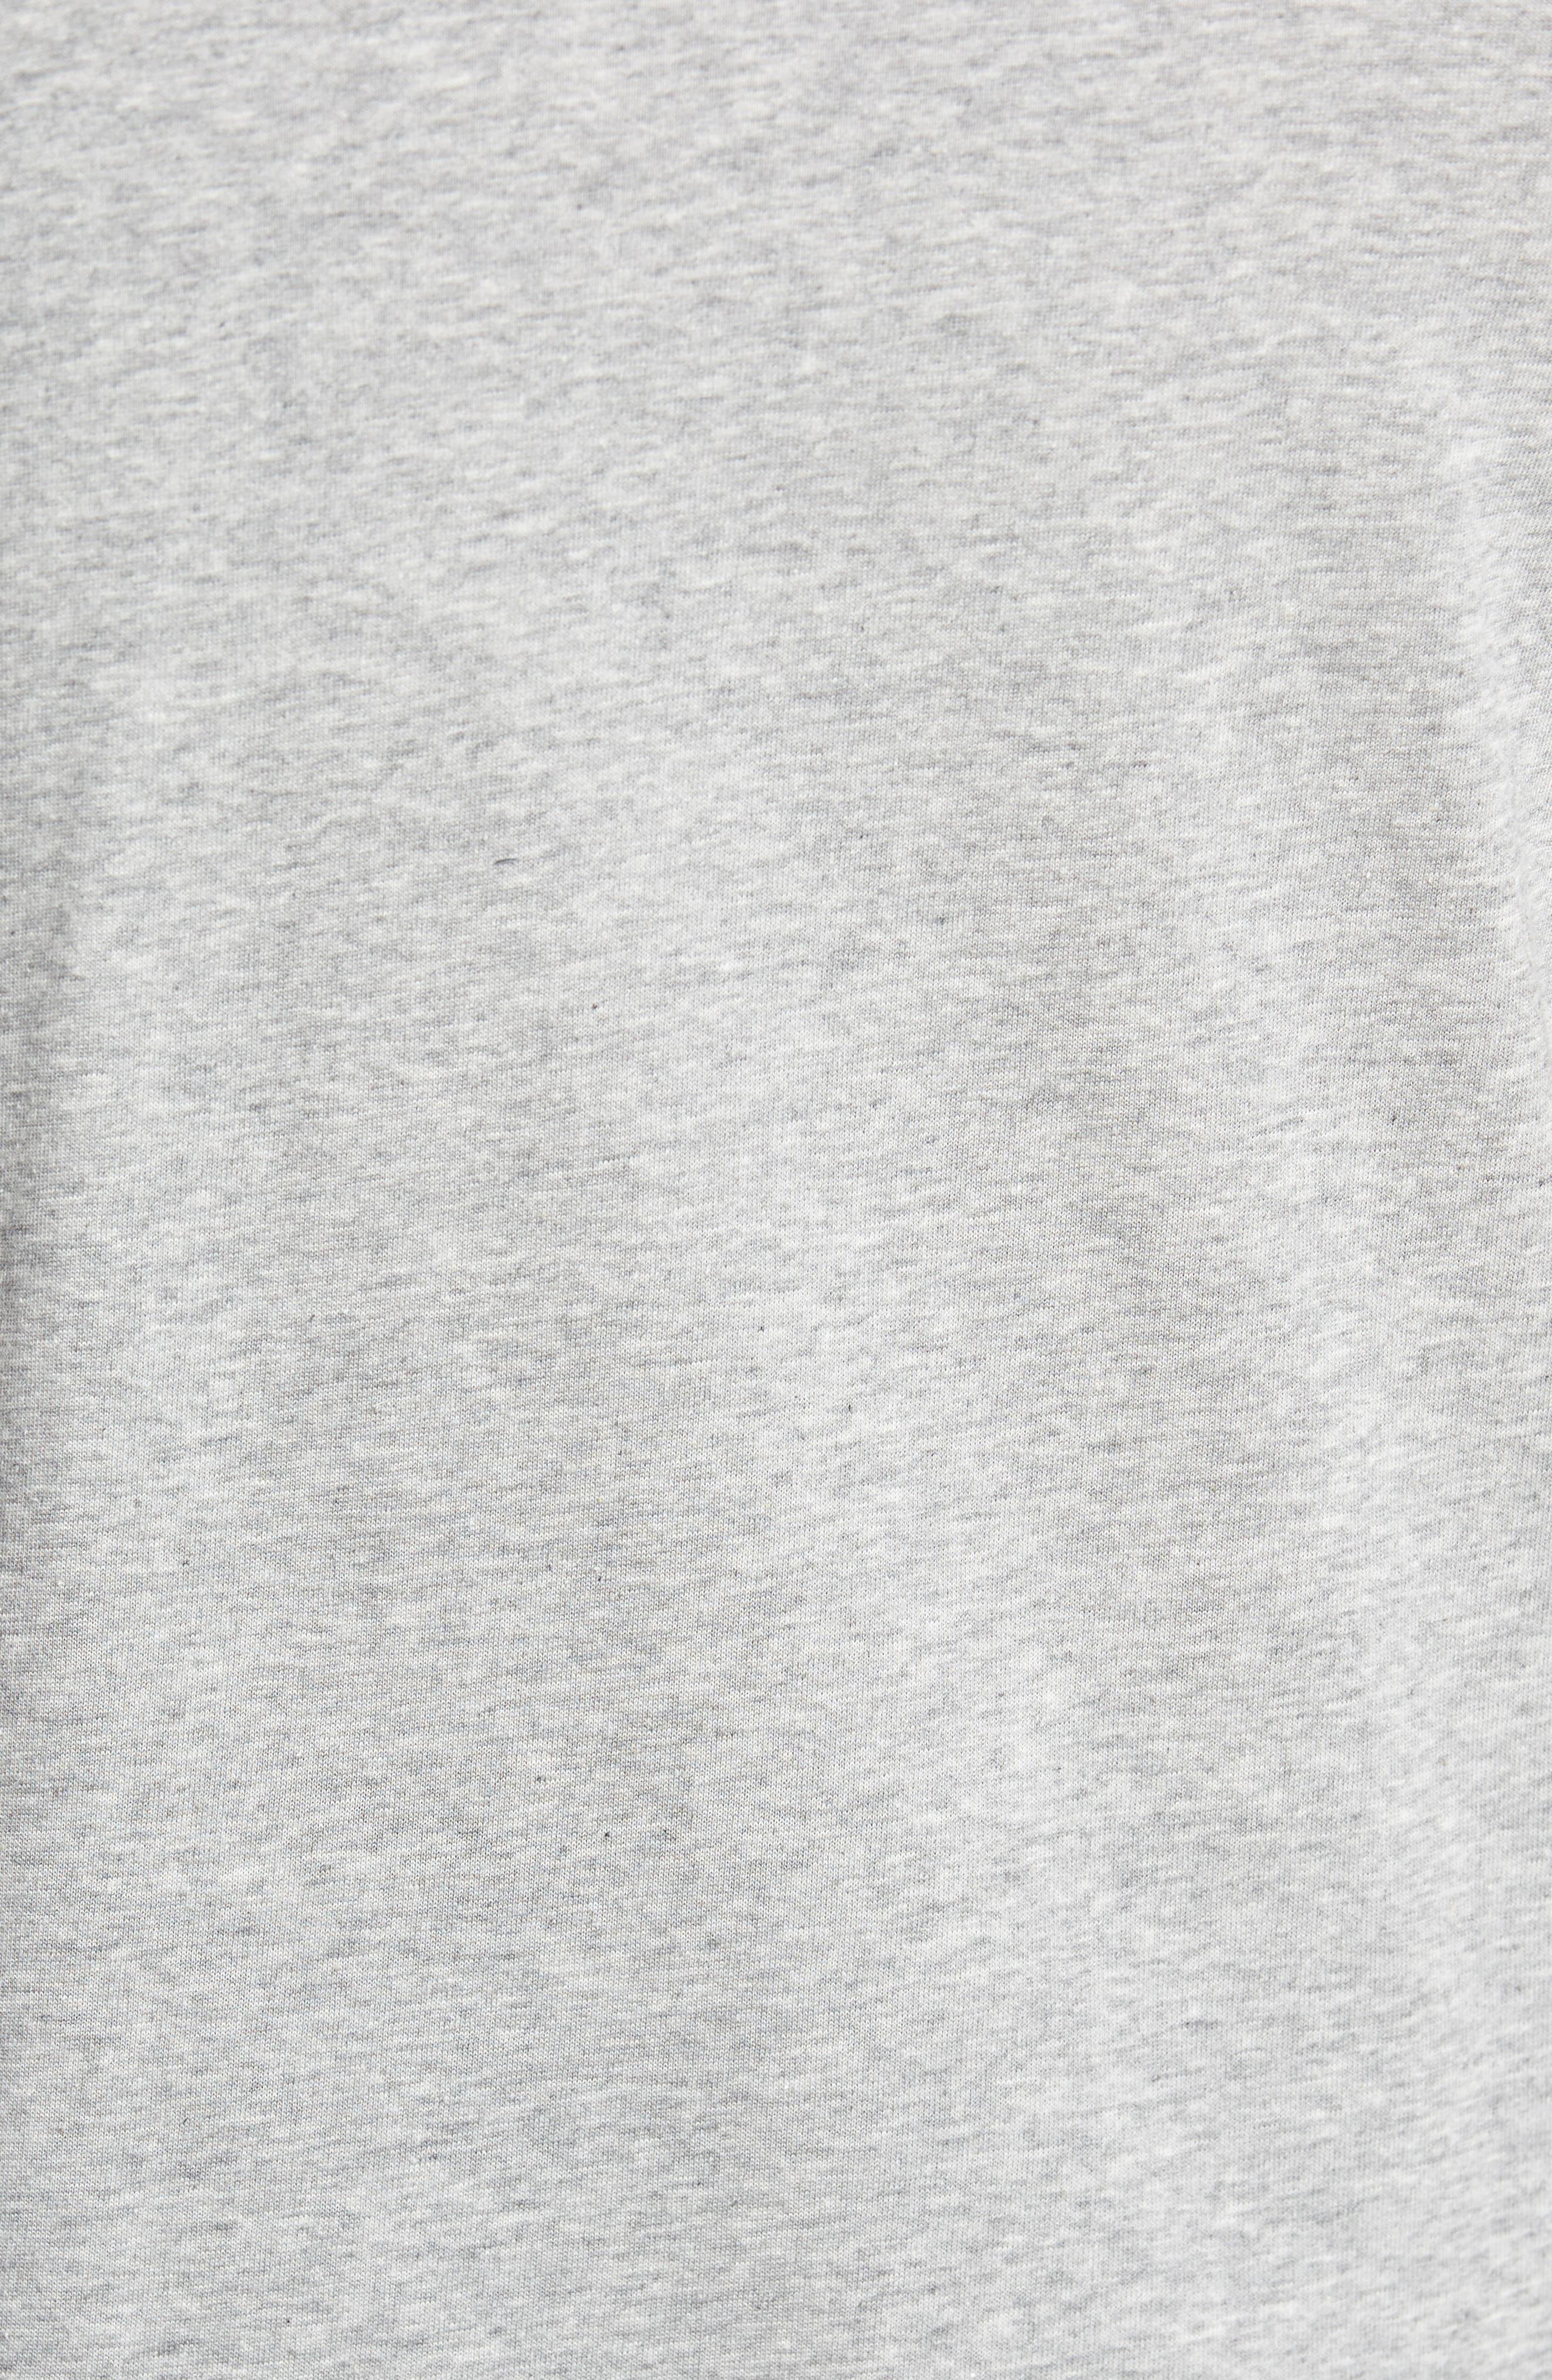 Dry Swooshie Crewneck T-Shirt,                             Alternate thumbnail 5, color,                             Dark Grey Heather/ Black